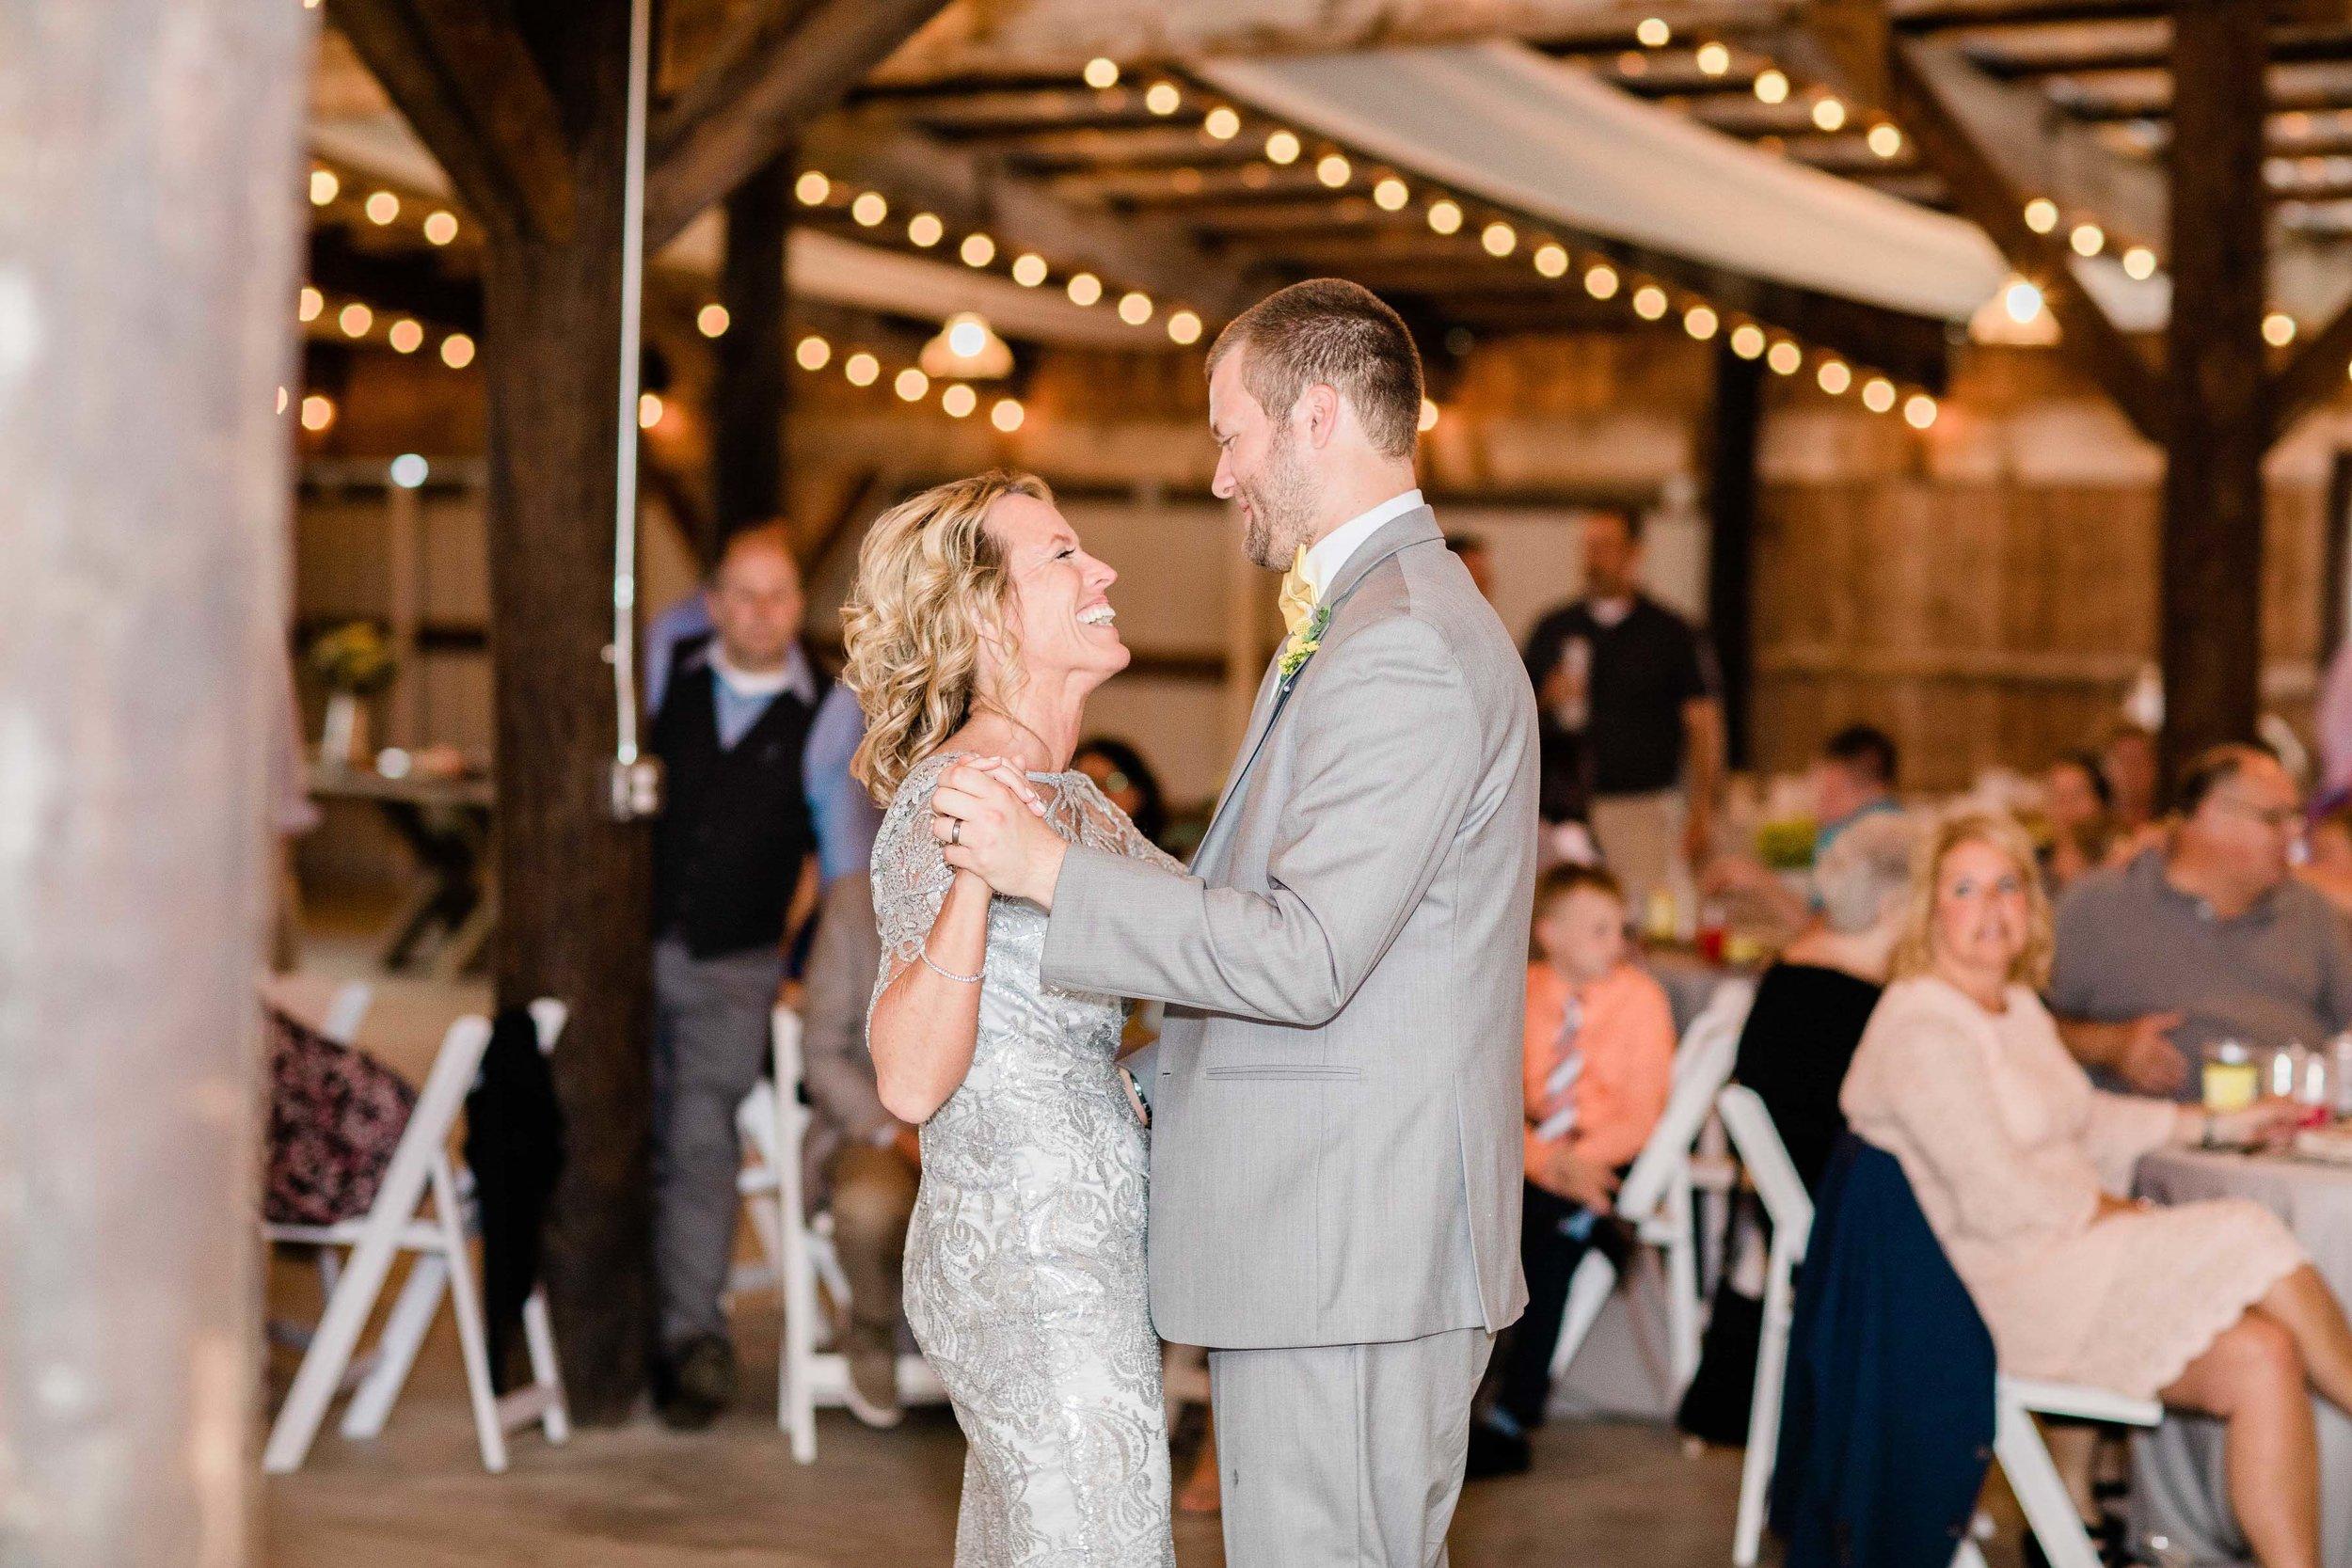 r buckeye barn southwest ohio wedding photographer-8.jpg